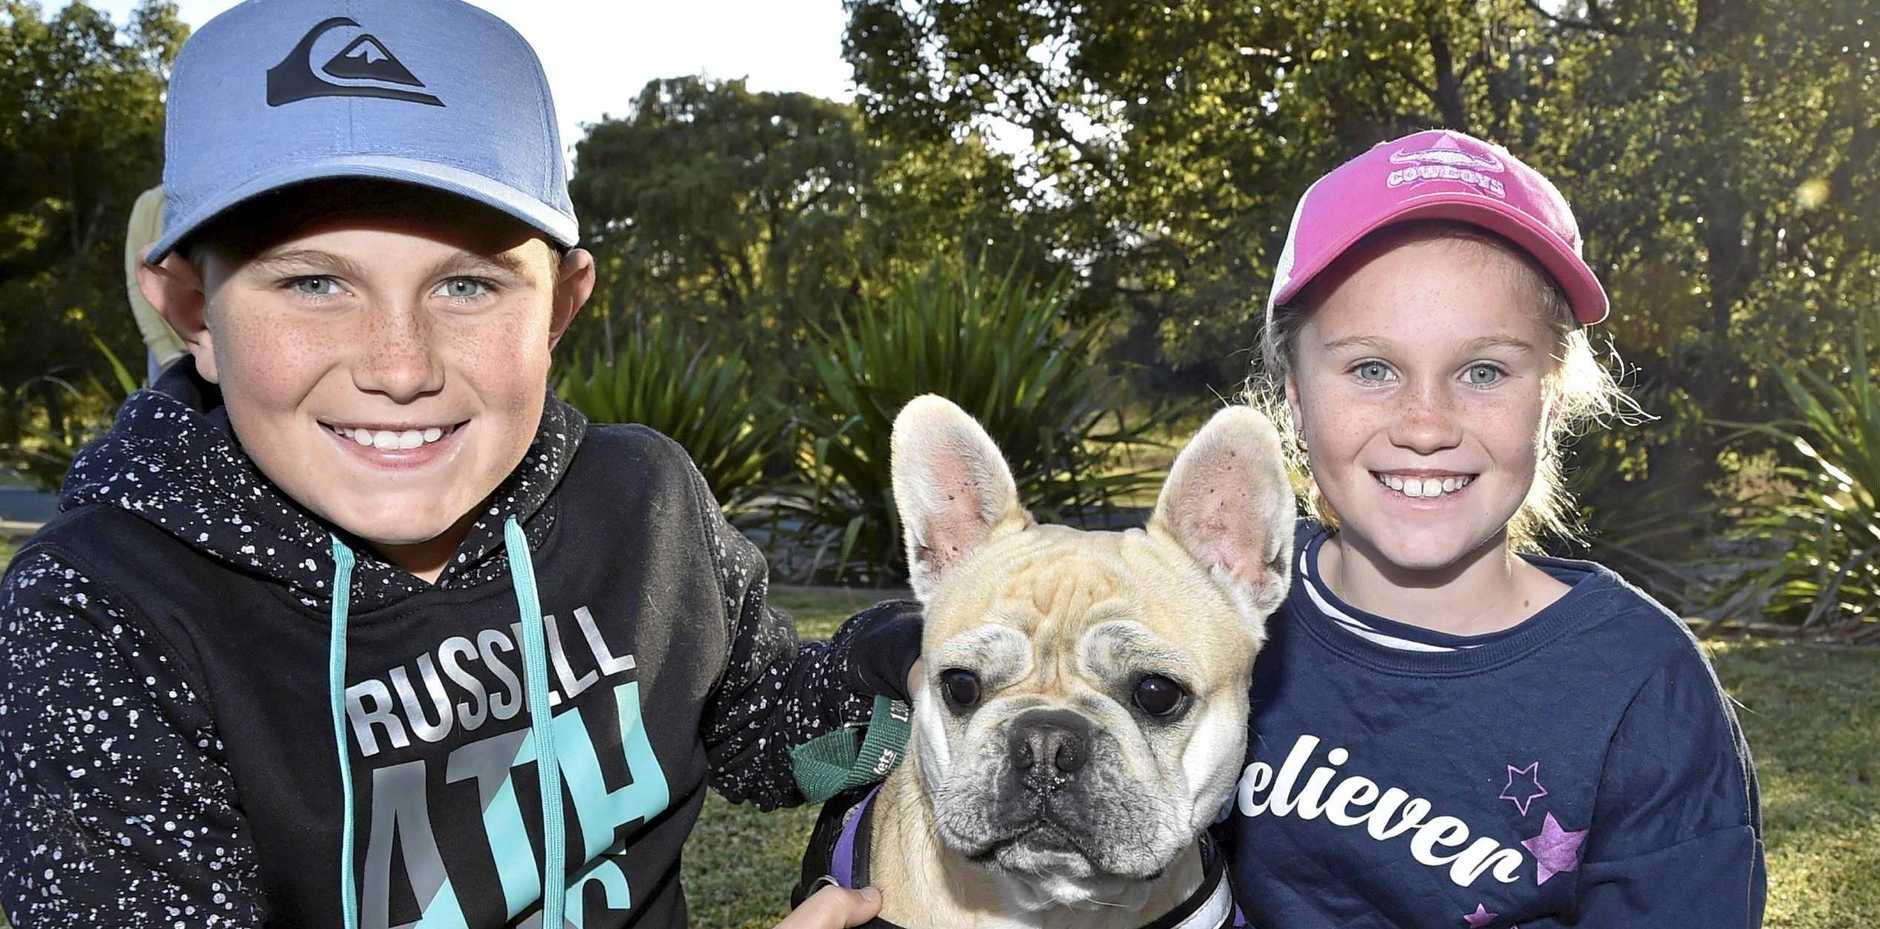 Flynn and Addyson Edards enjoy the Willows Walkies event with their beautiful dog, Hazel.